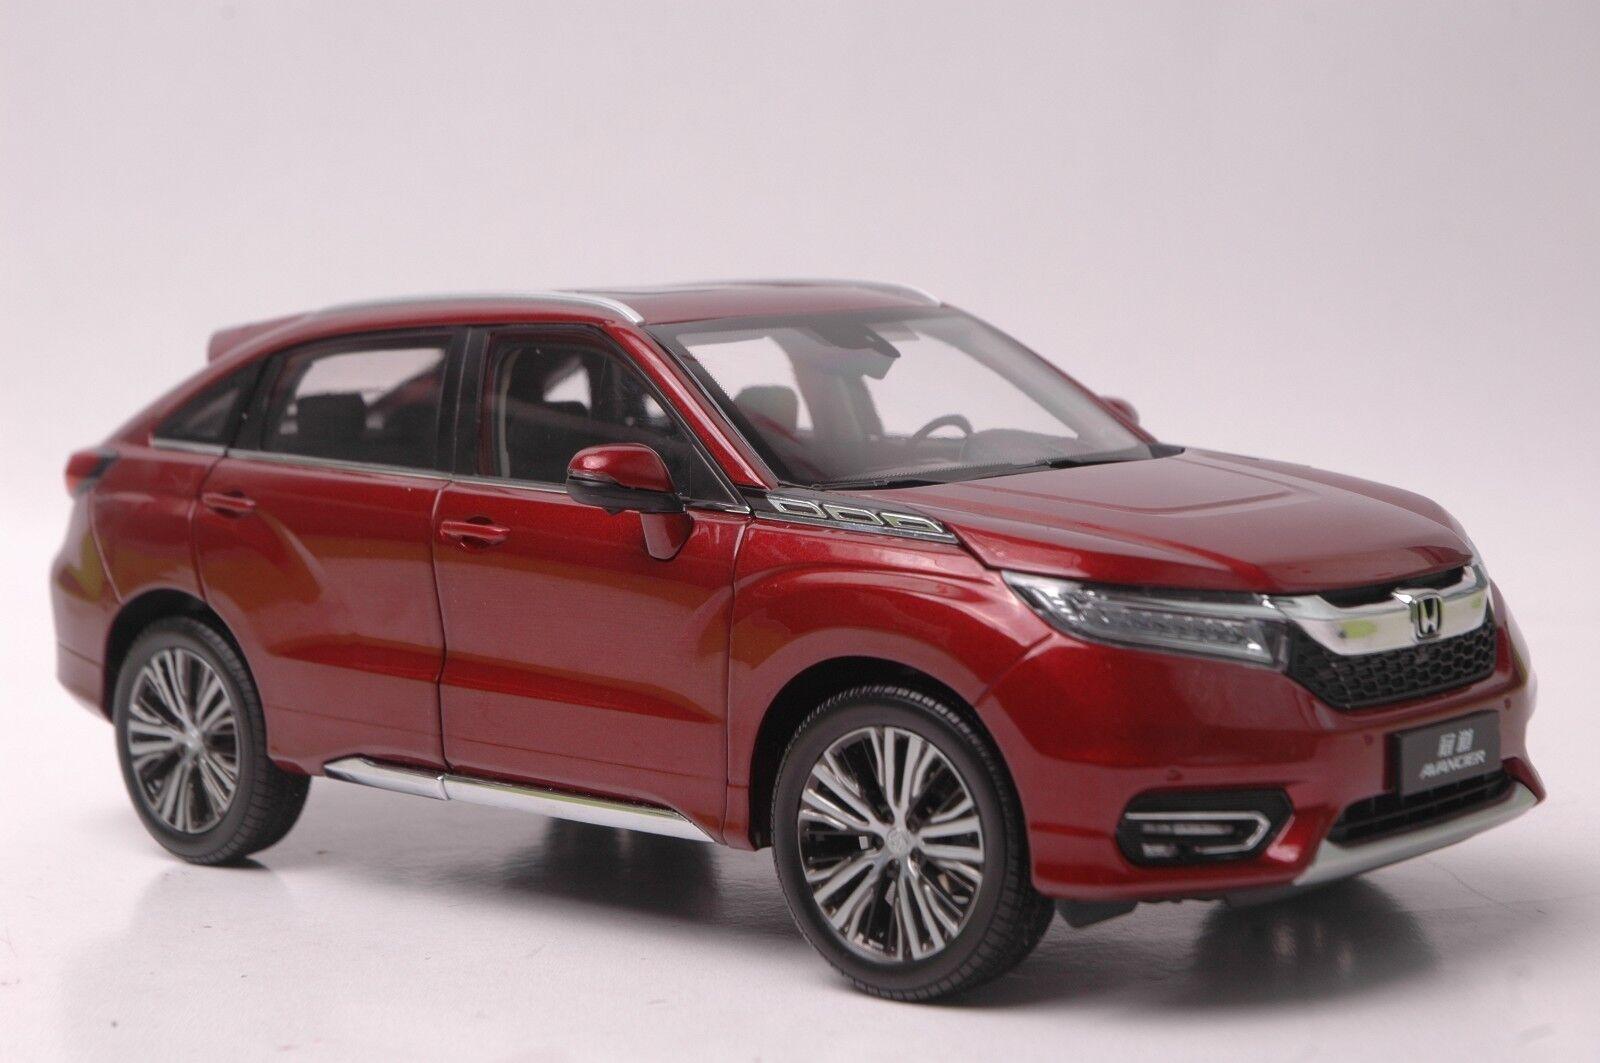 Honda Avancier 2016 car model in scale 1 18 red